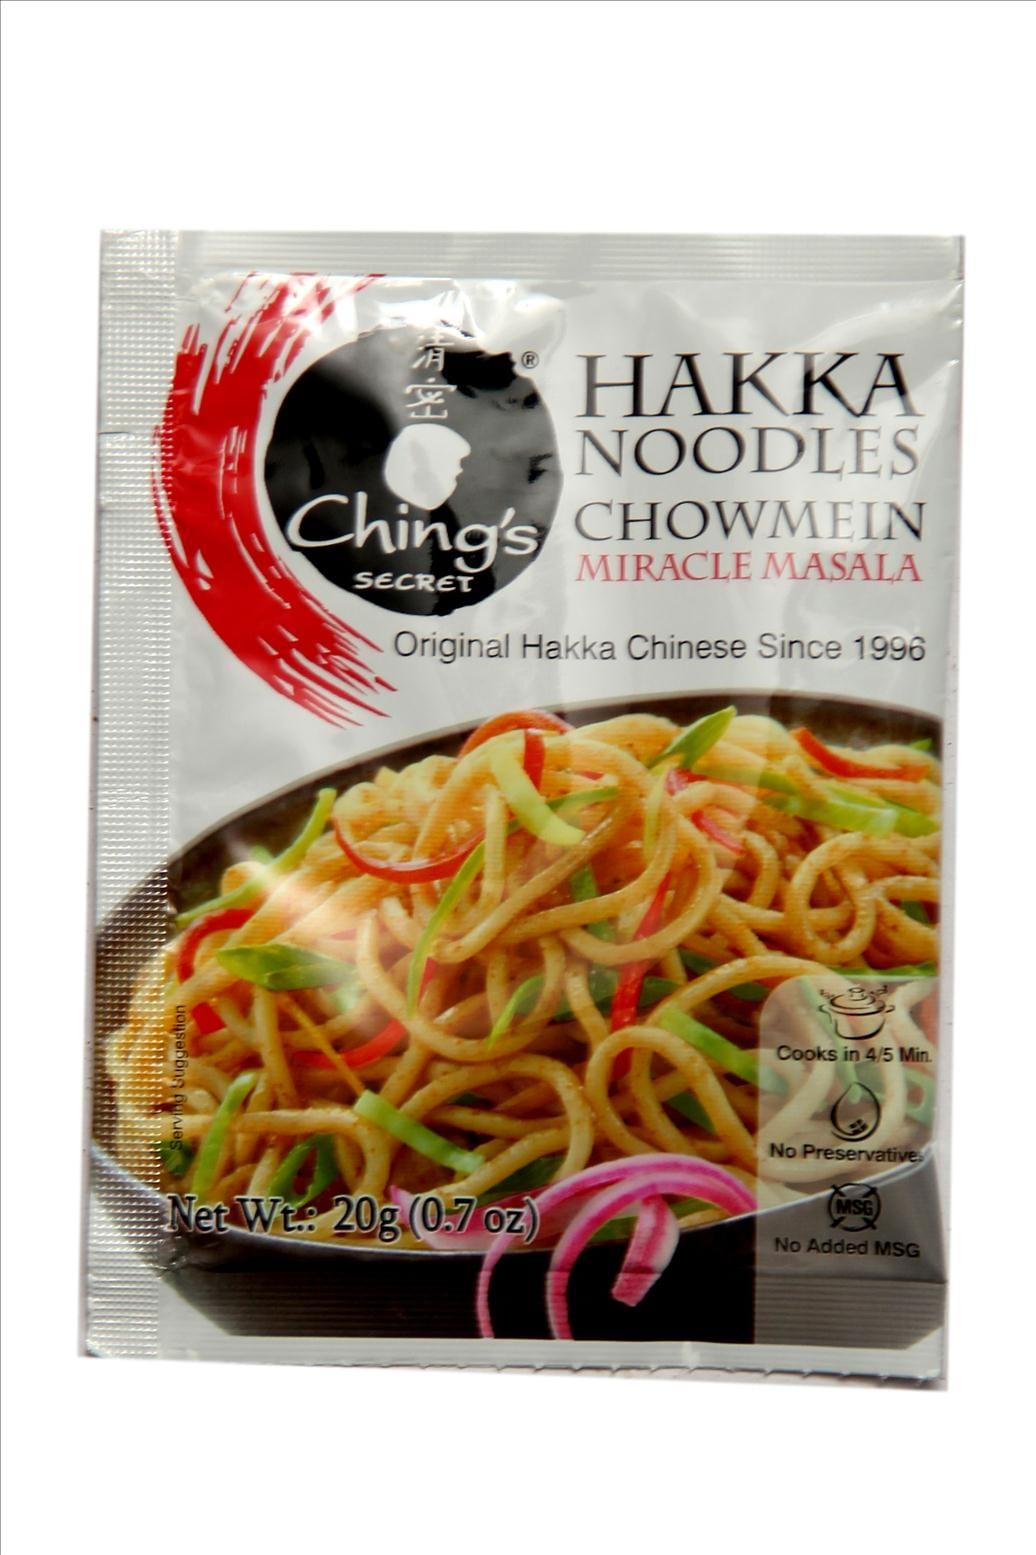 Ching's Secret Hakka Noodles Chowmein Miracle Masala 20 Gm